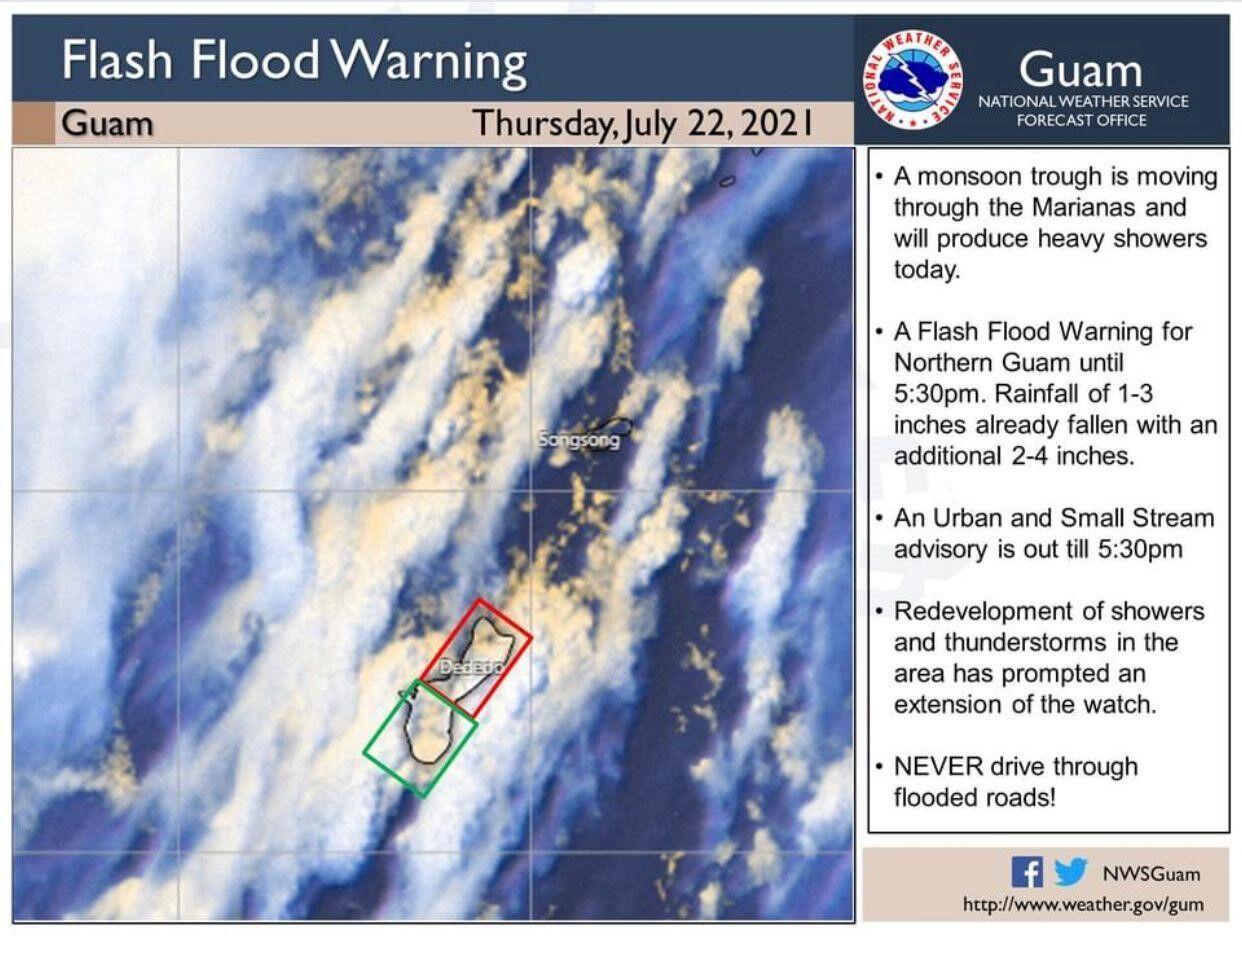 Flash flood warning for northern Guam